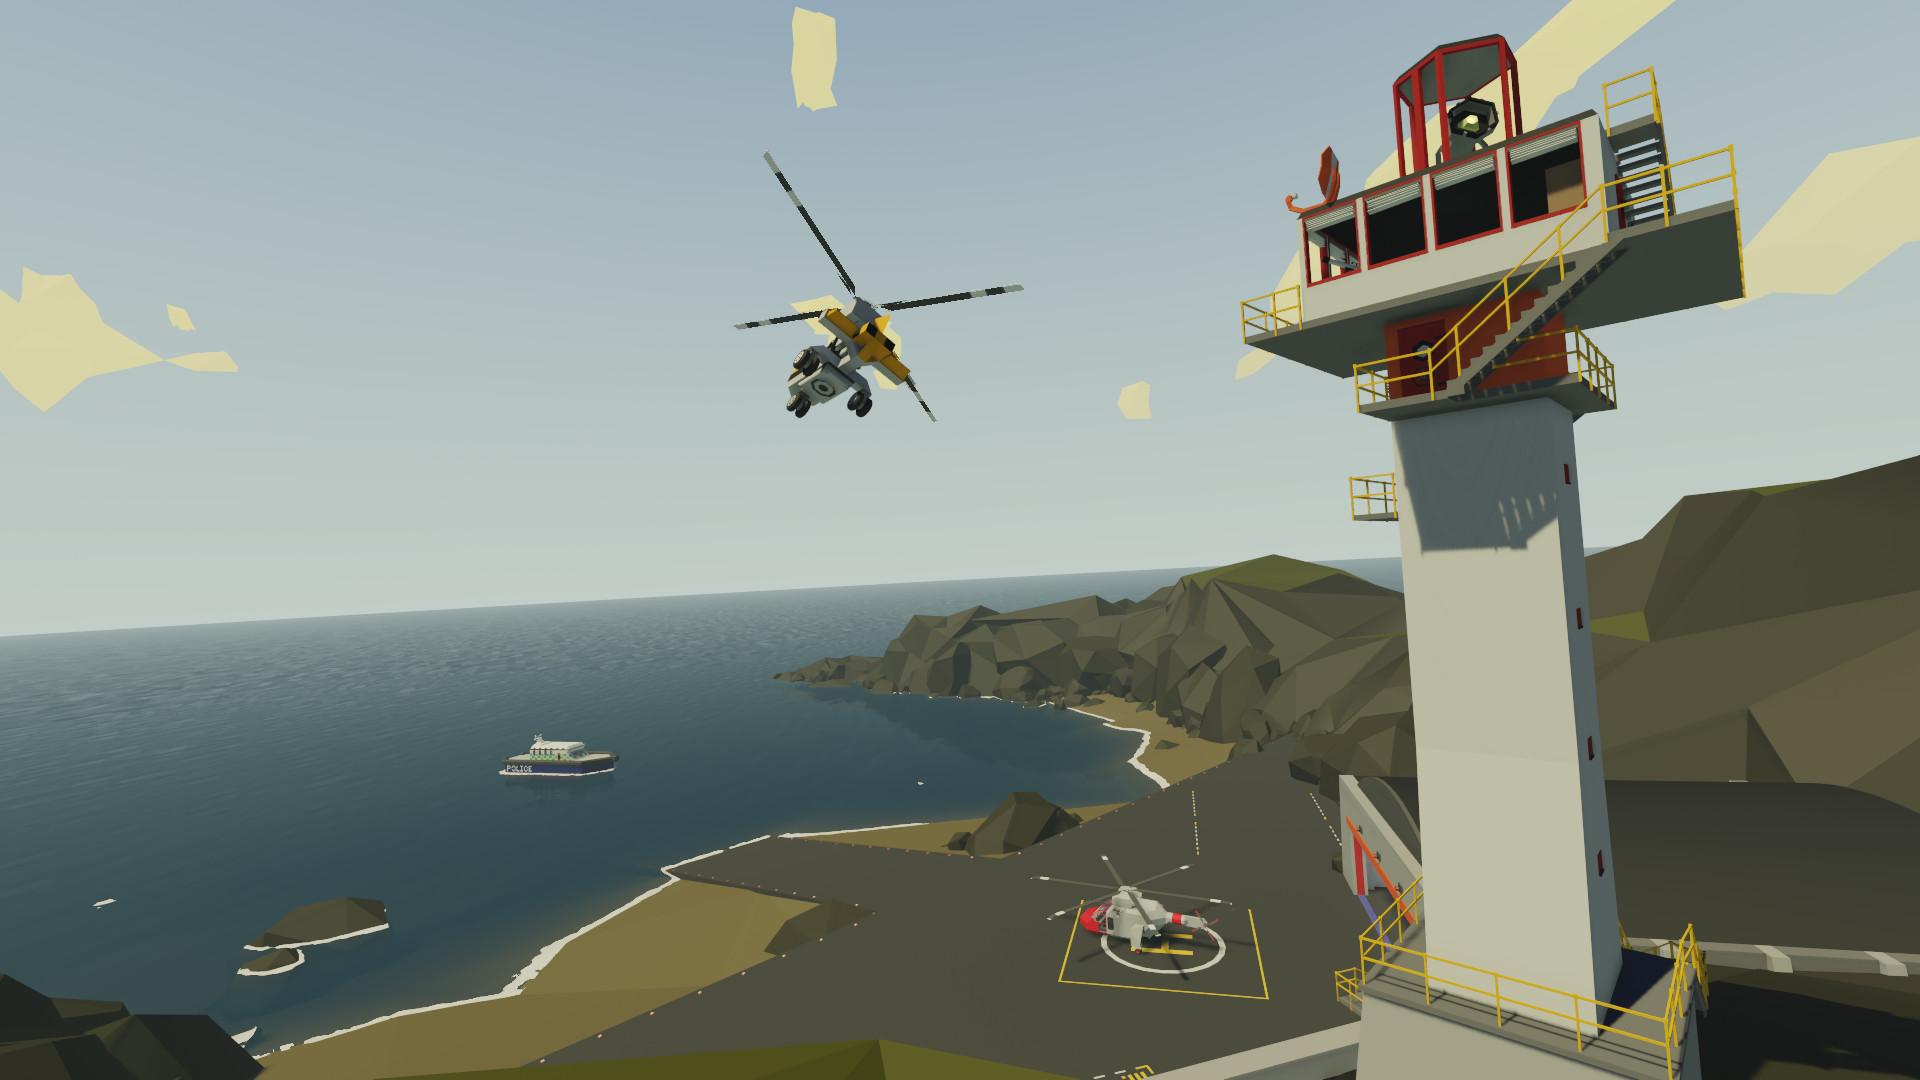 Скриншоты к Stormworks: Build and Rescue v0.1.6 полная версия